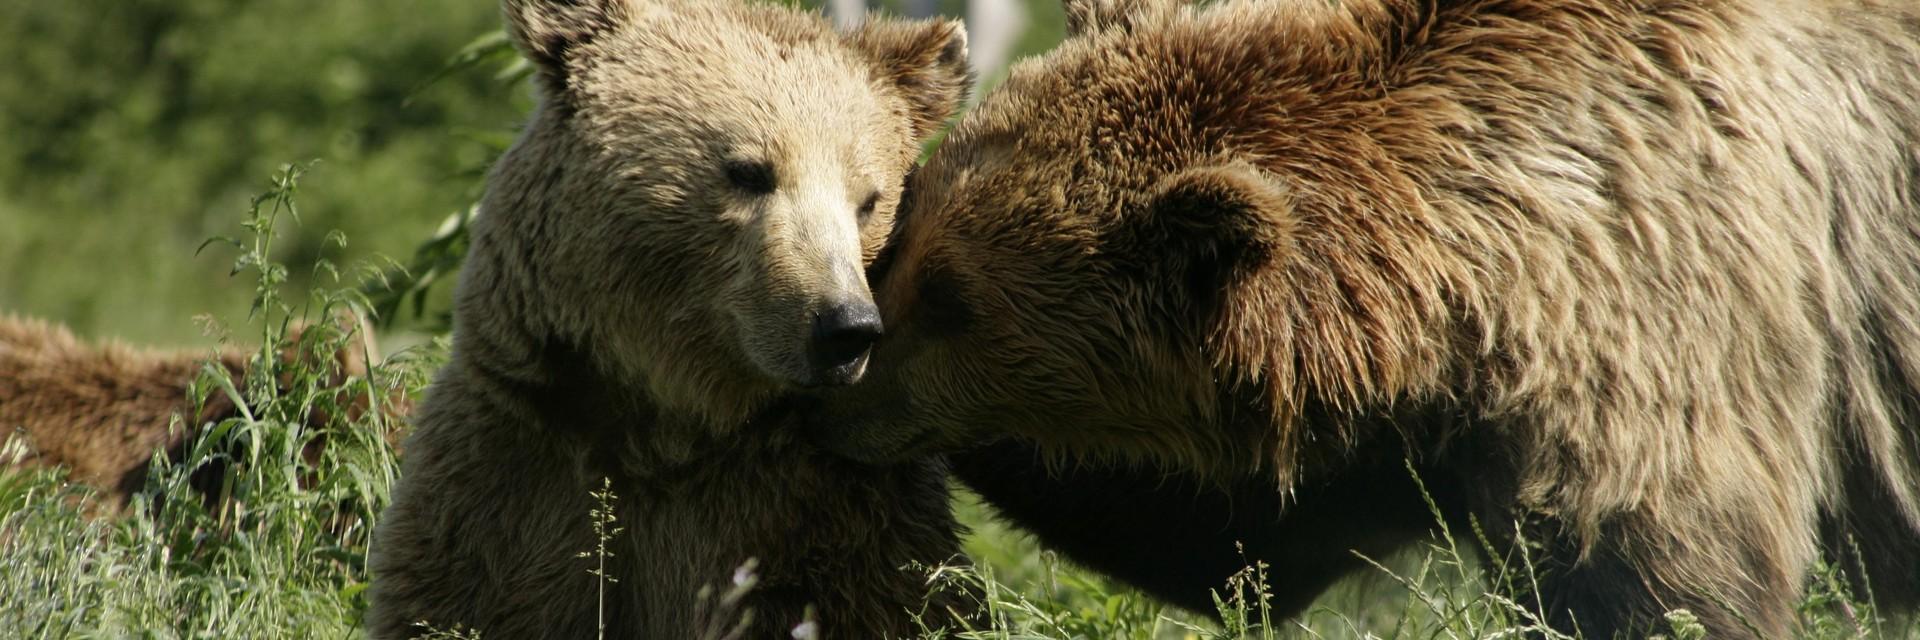 Bears in the sunshine